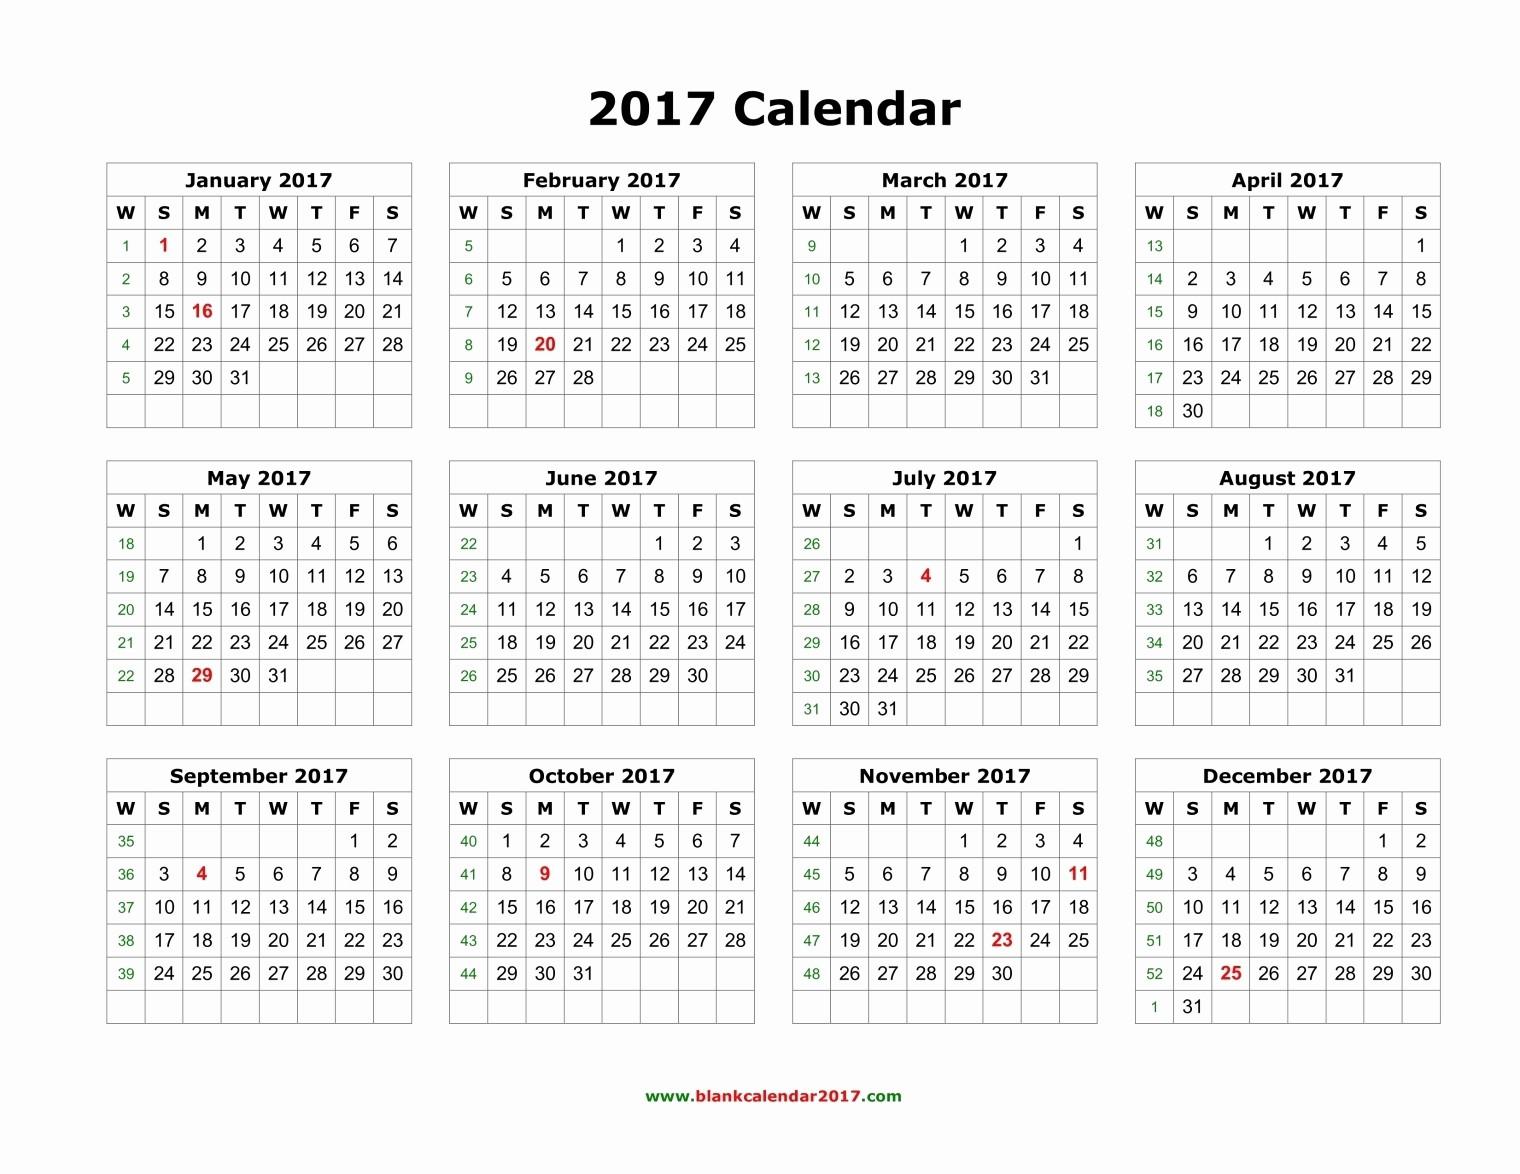 2017 Calendar Template Word Document New 2017 Printable Calendar Word